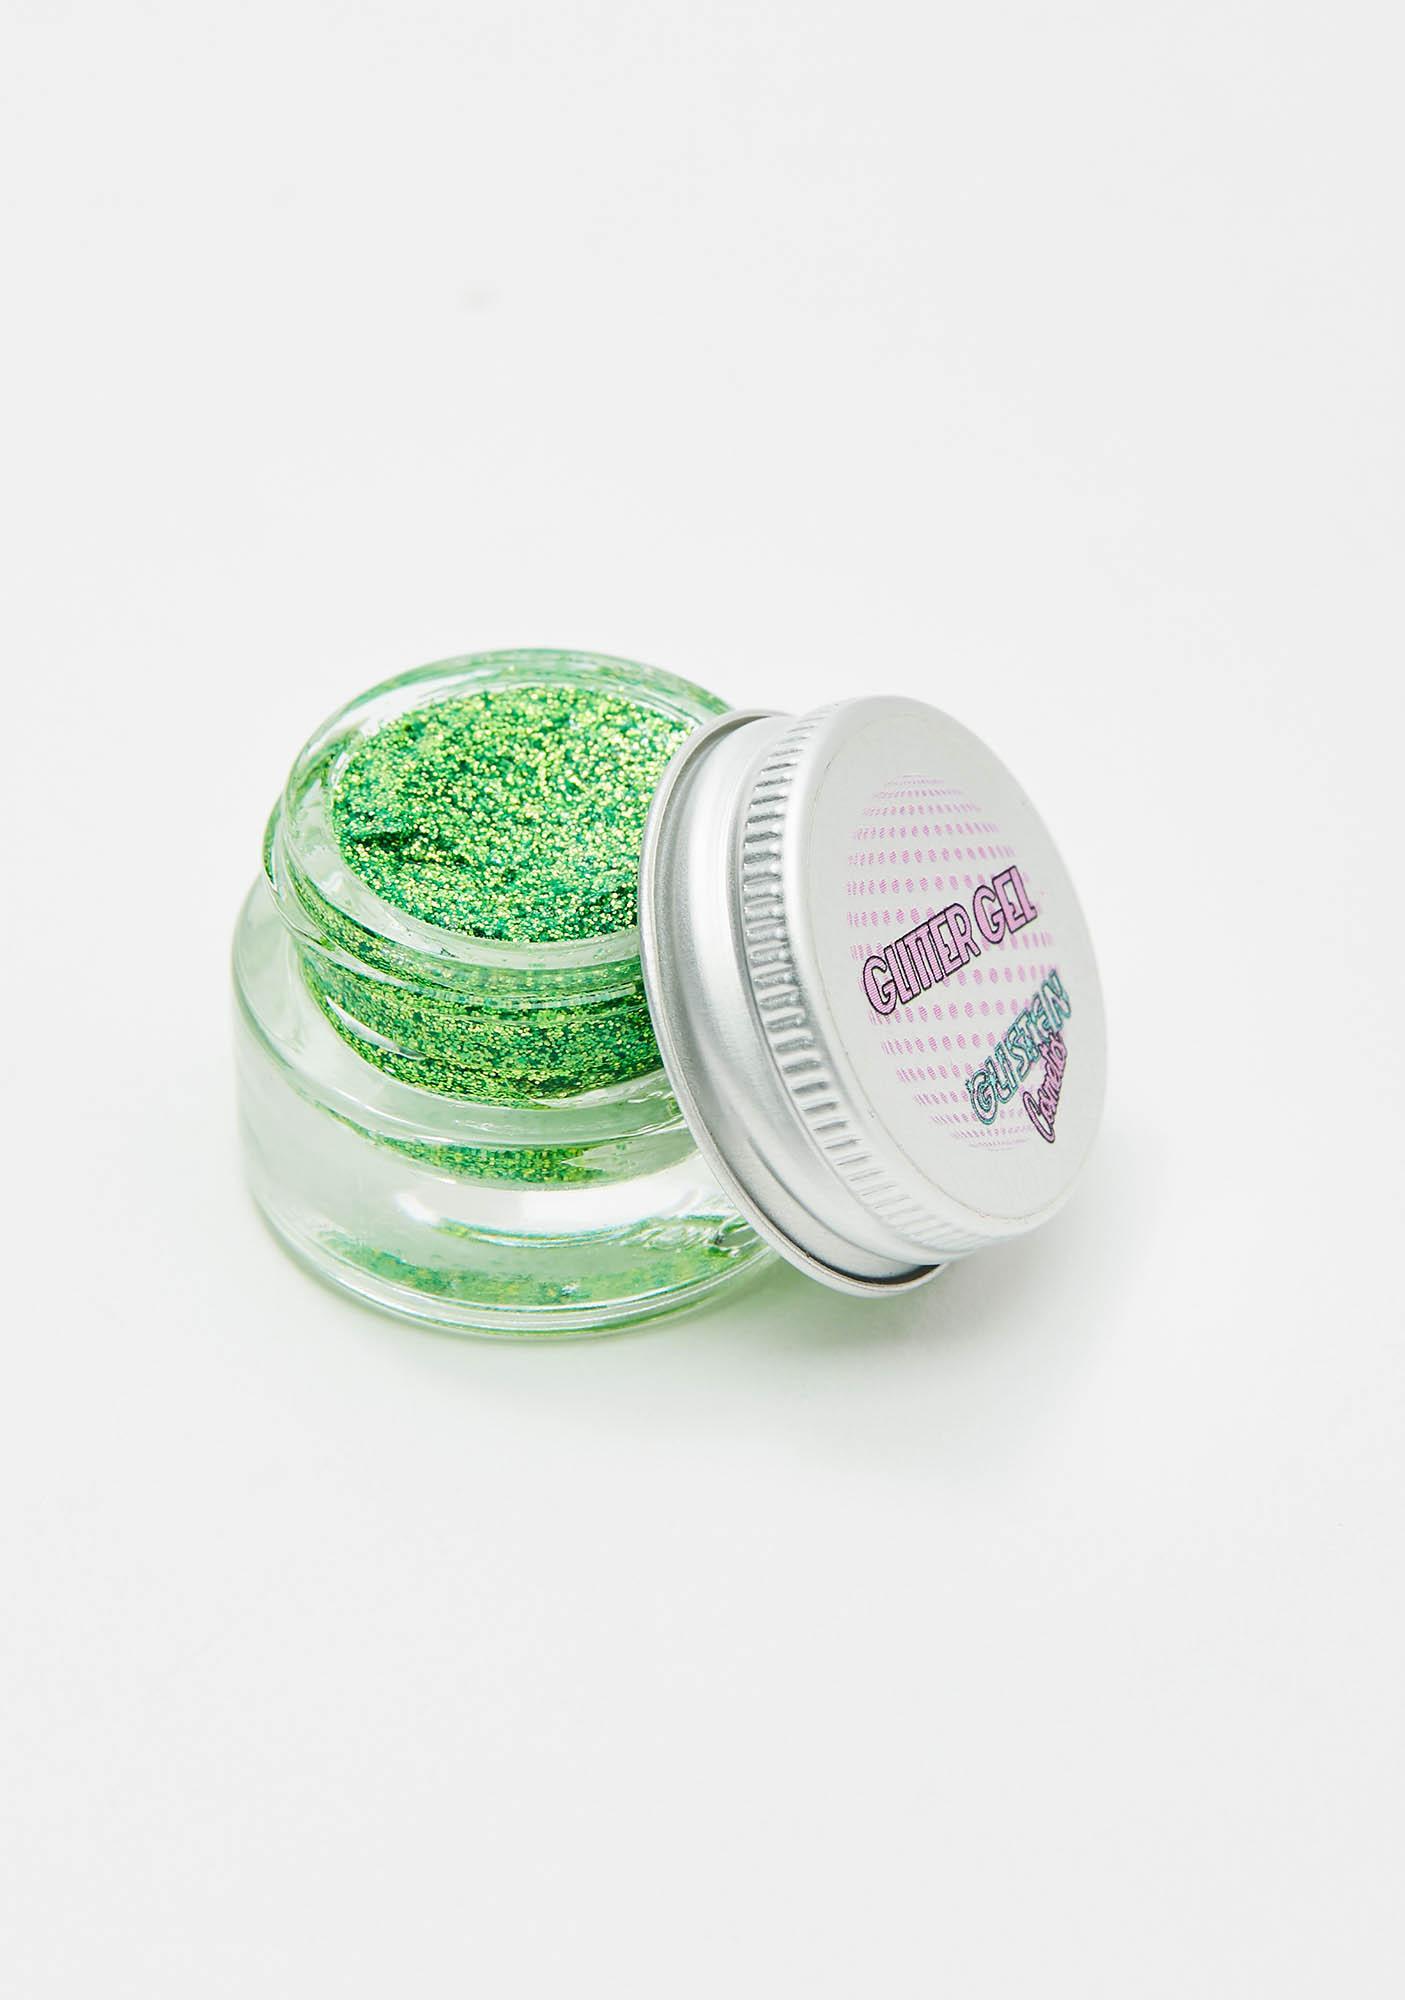 Glisten Cosmetics Slime Glitter Gel